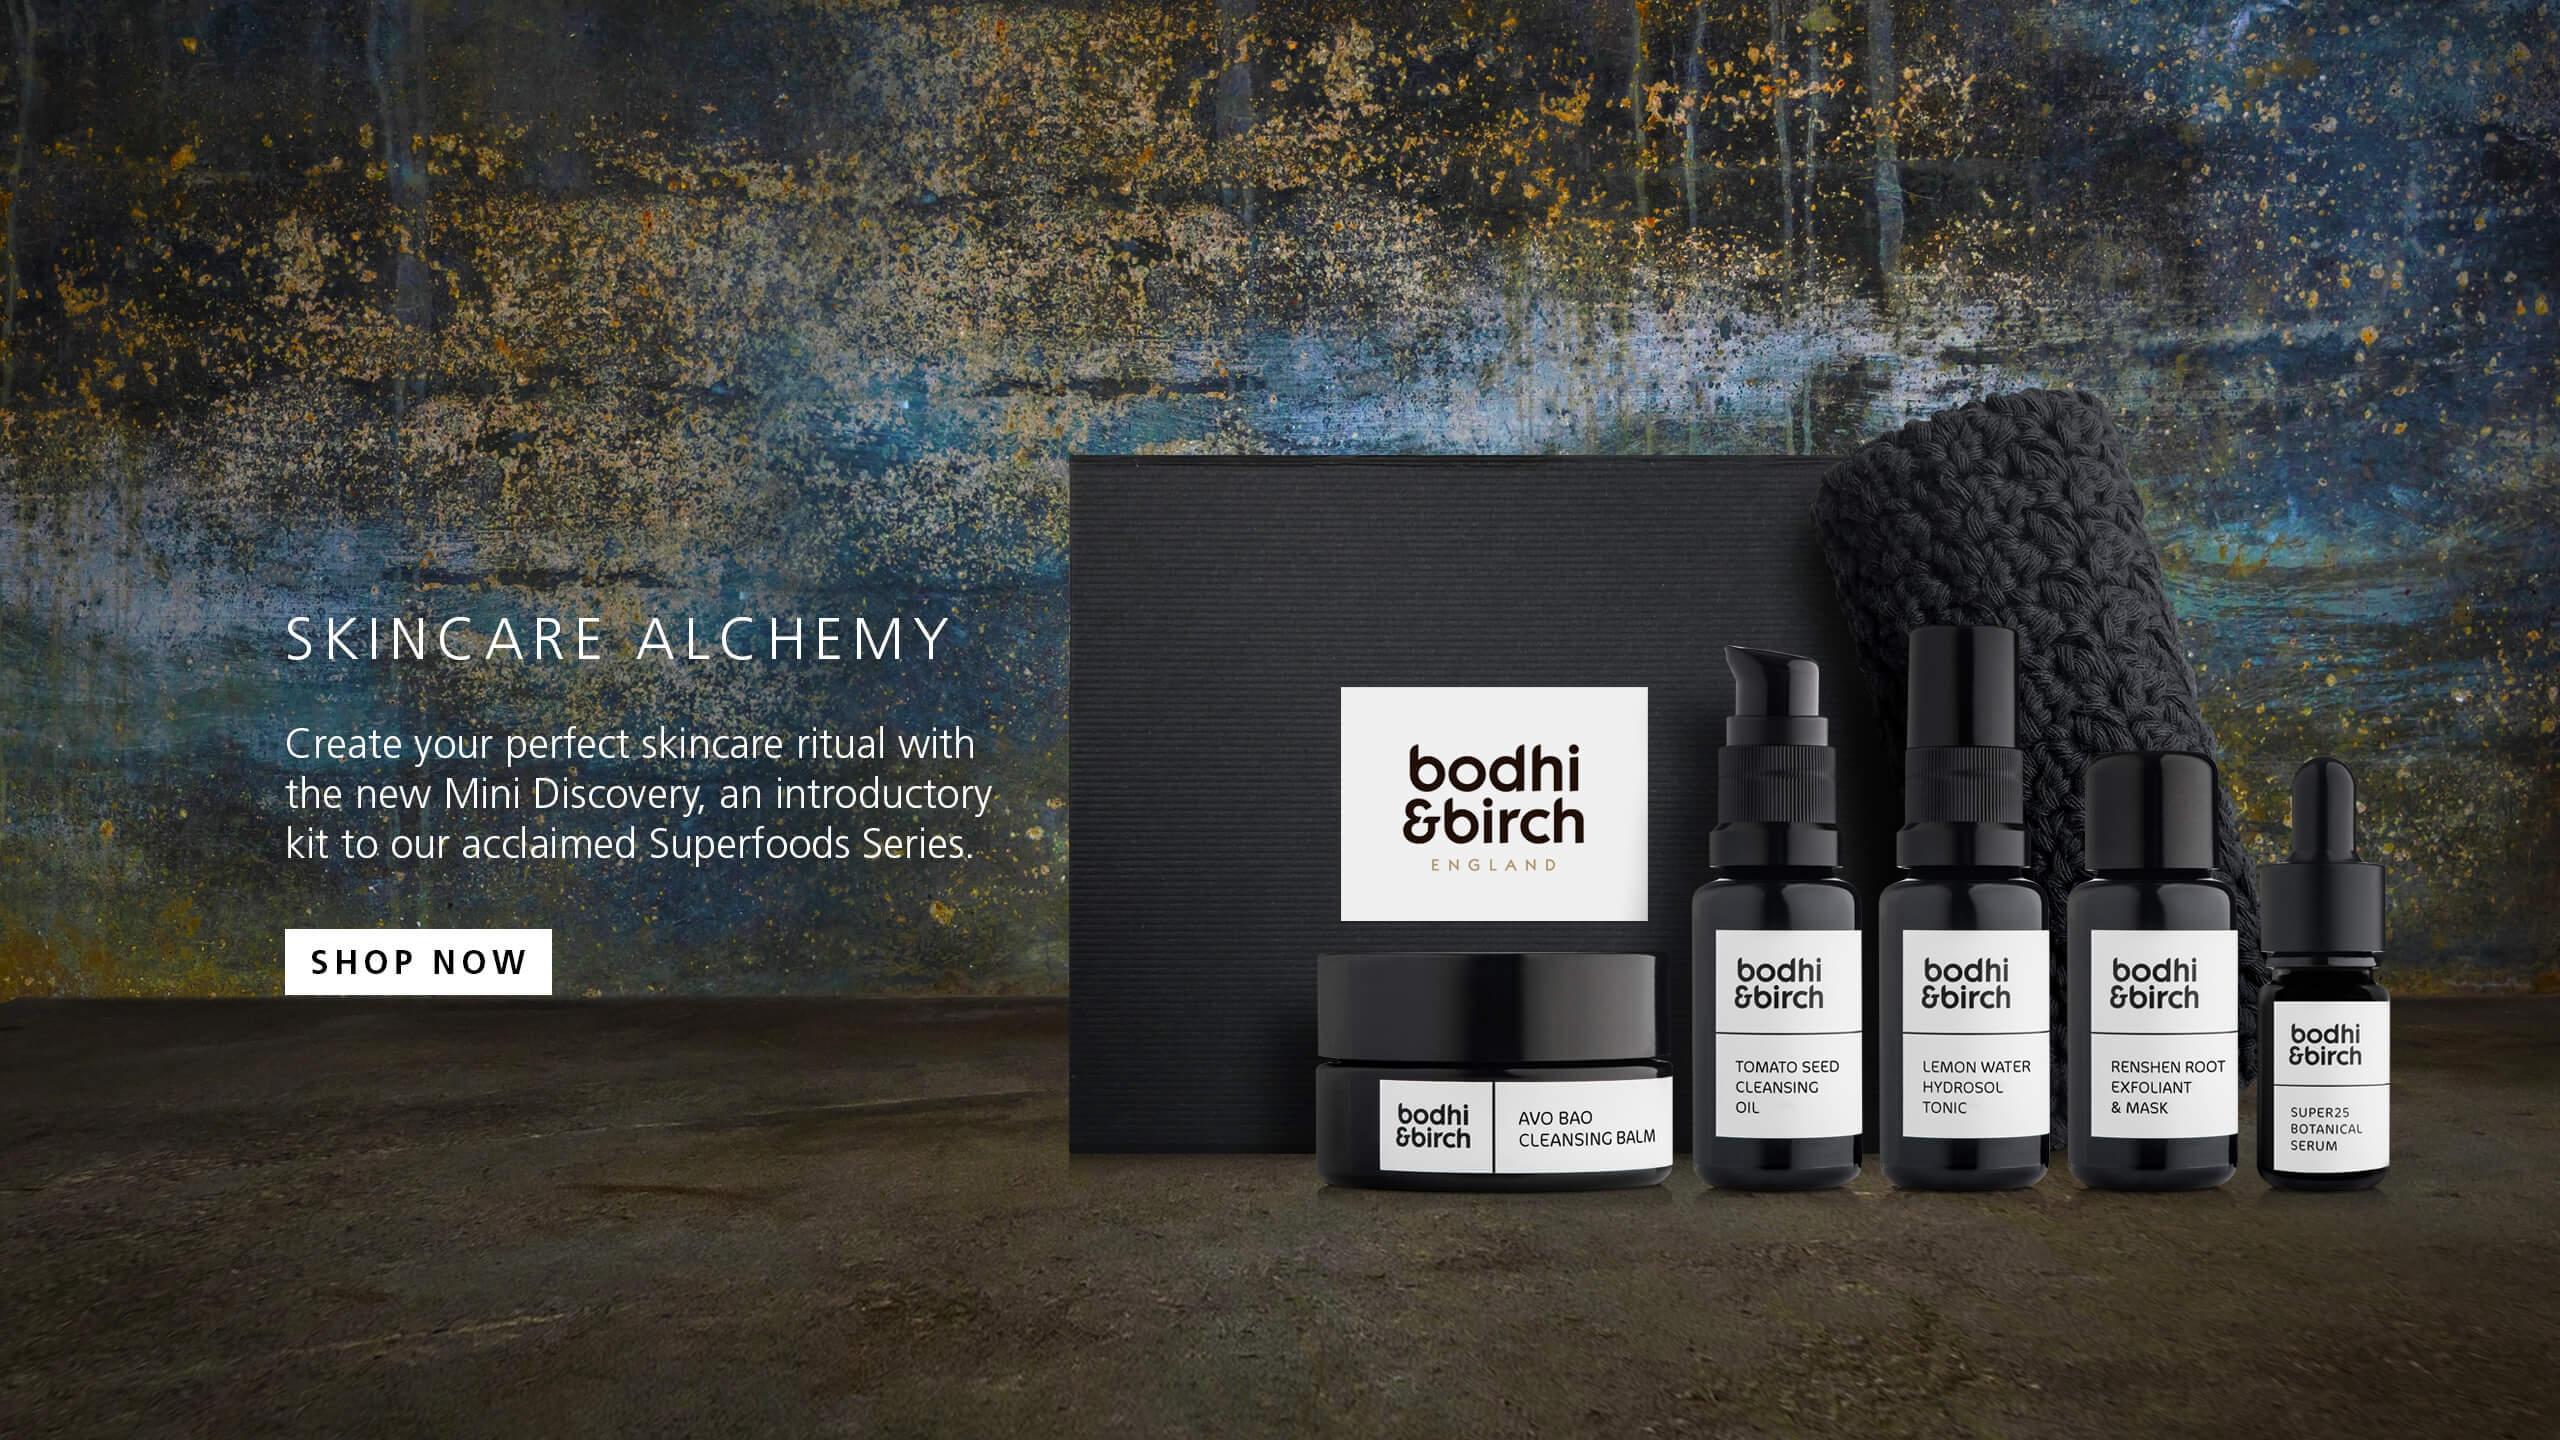 Skincare Alchemy